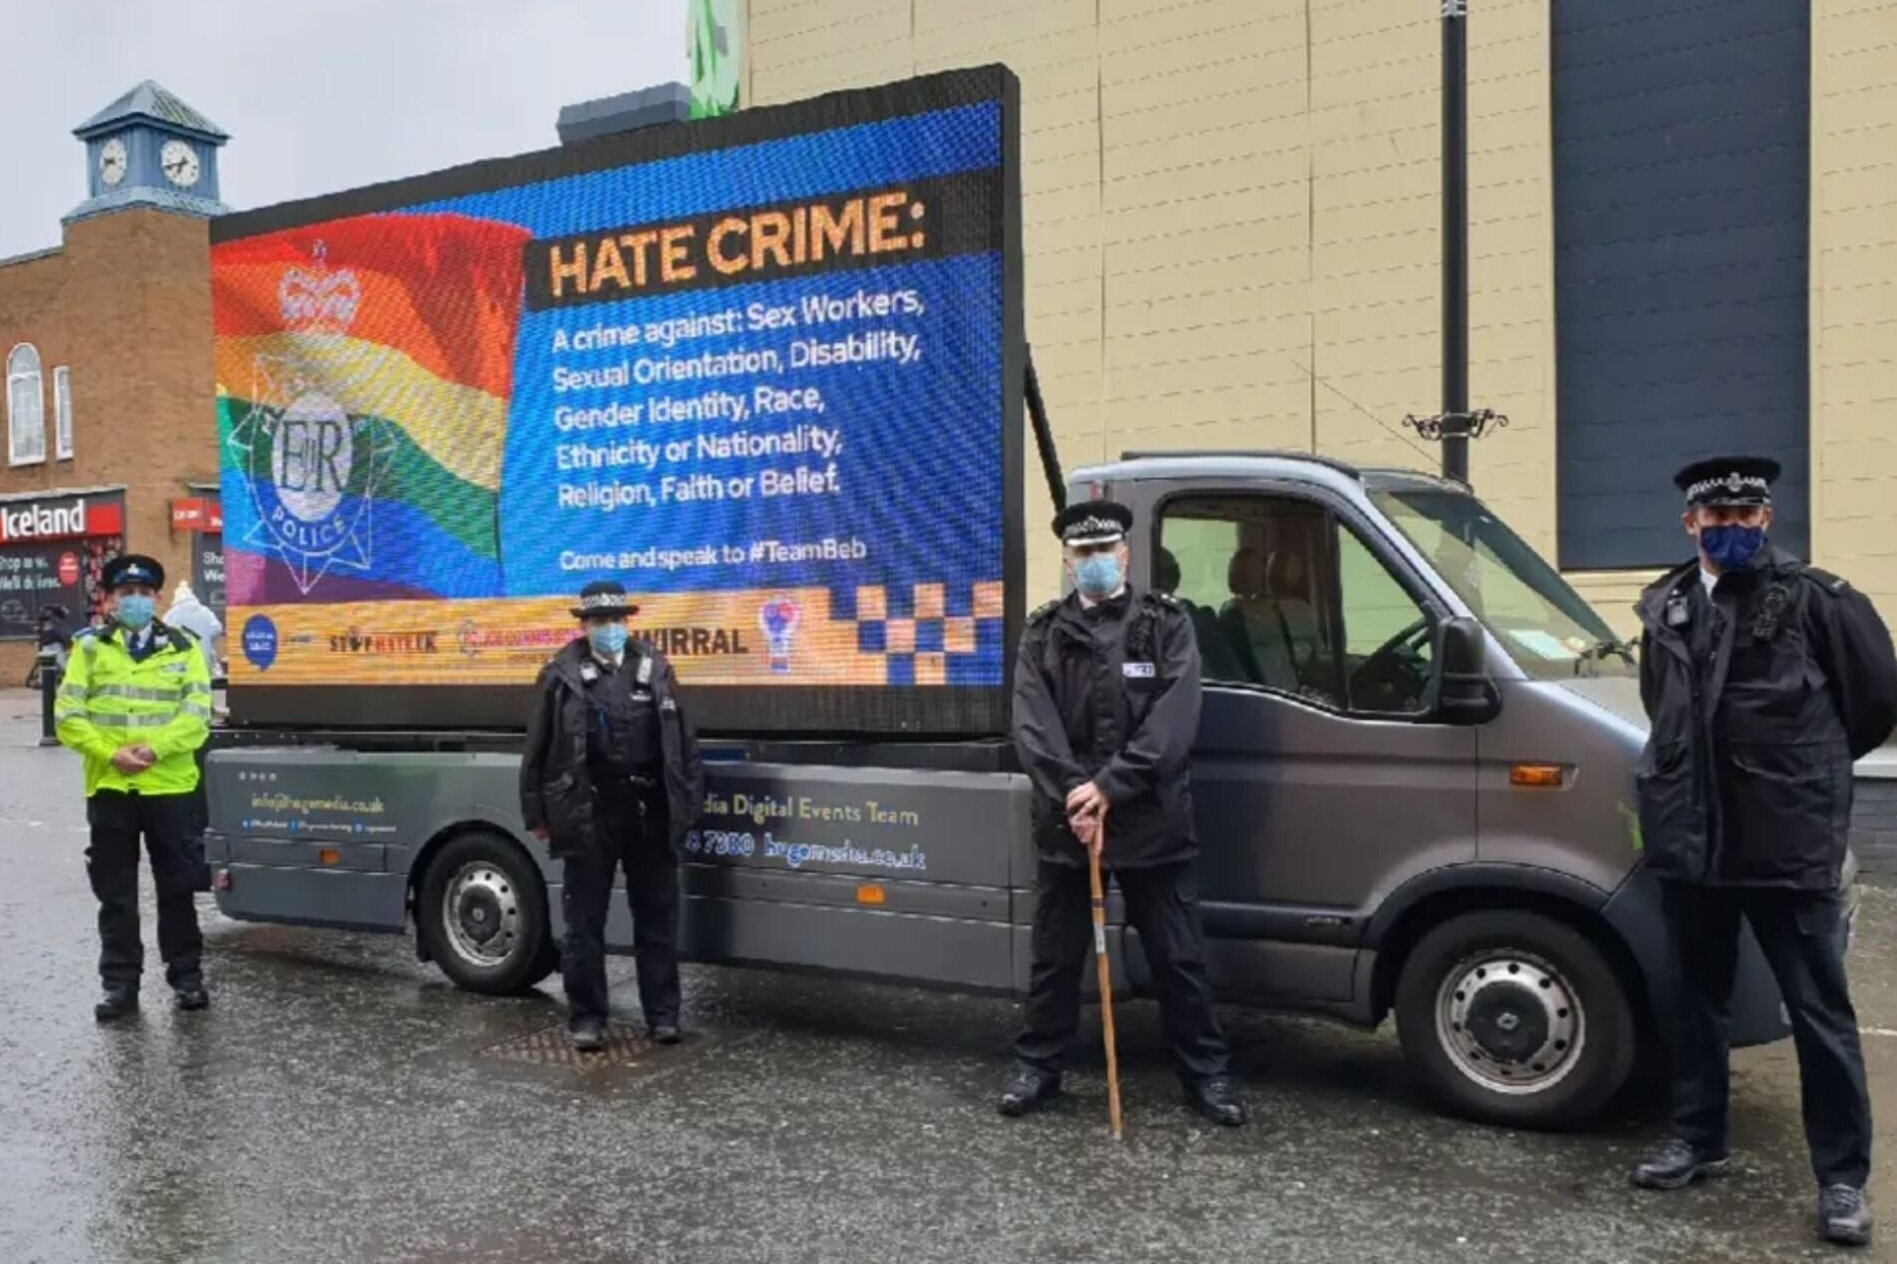 Merseyside Police hire van to encourage people to report hate crime